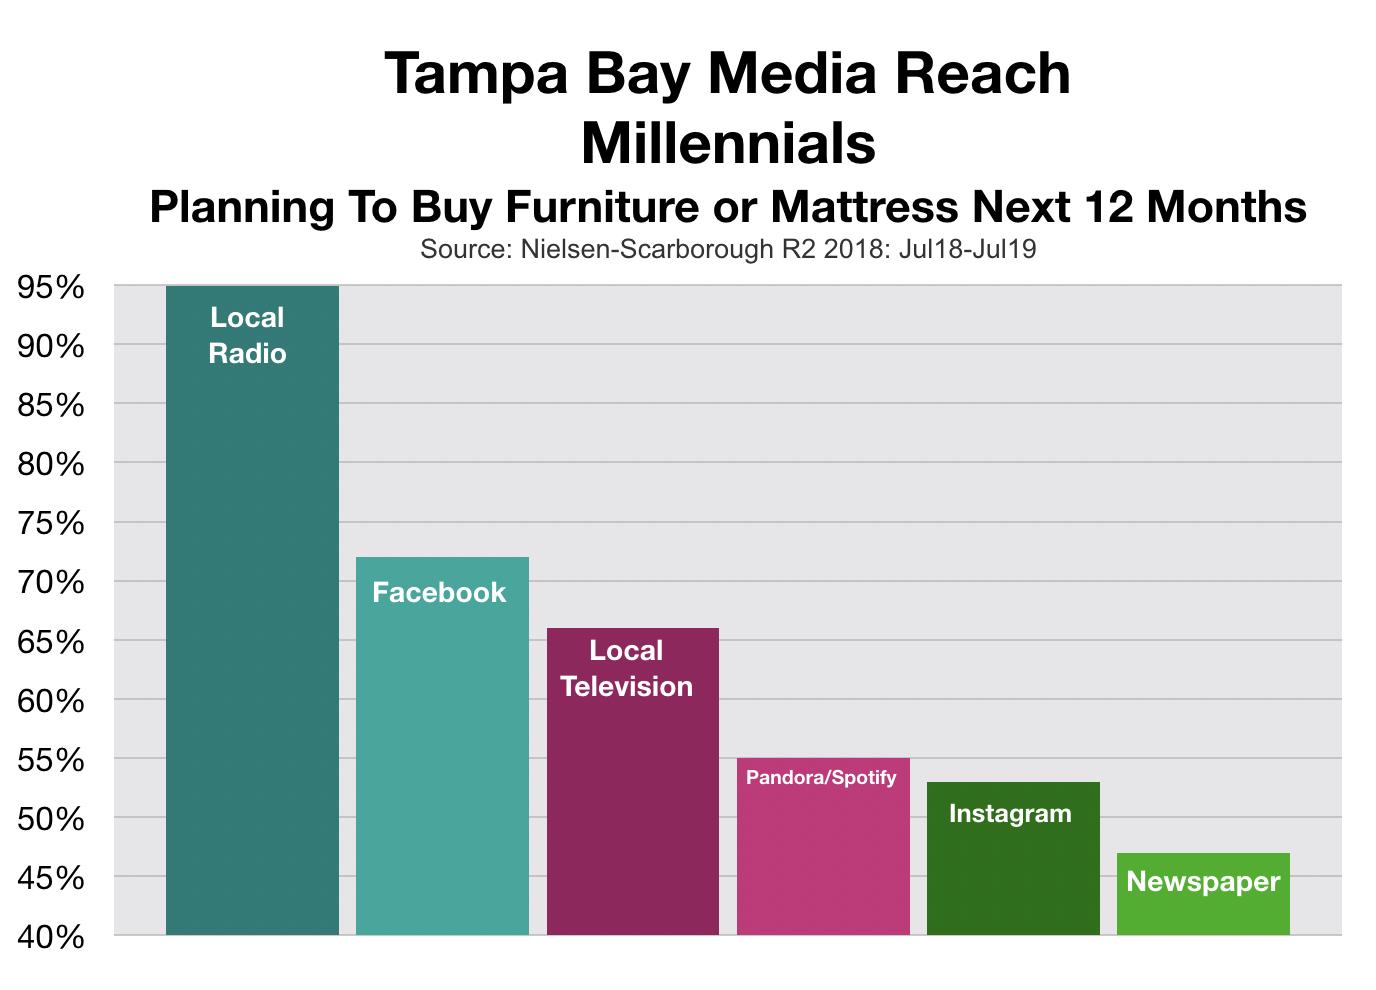 Furniture Store Advertising in Tampa Bay Millennials